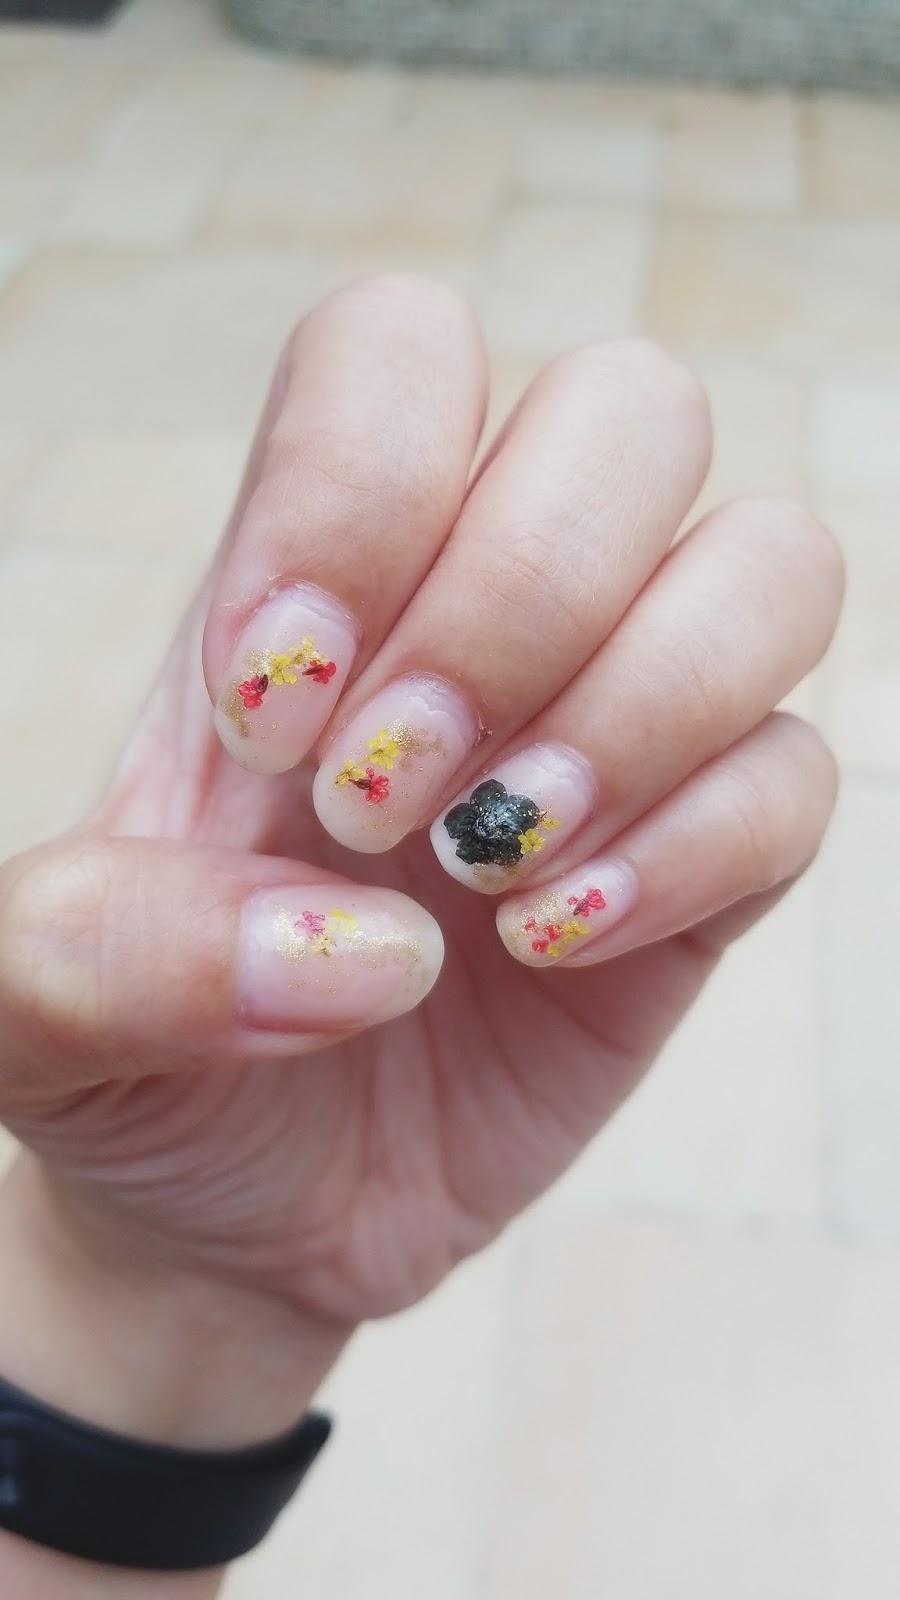 Dried Flower Nails - chichicho~